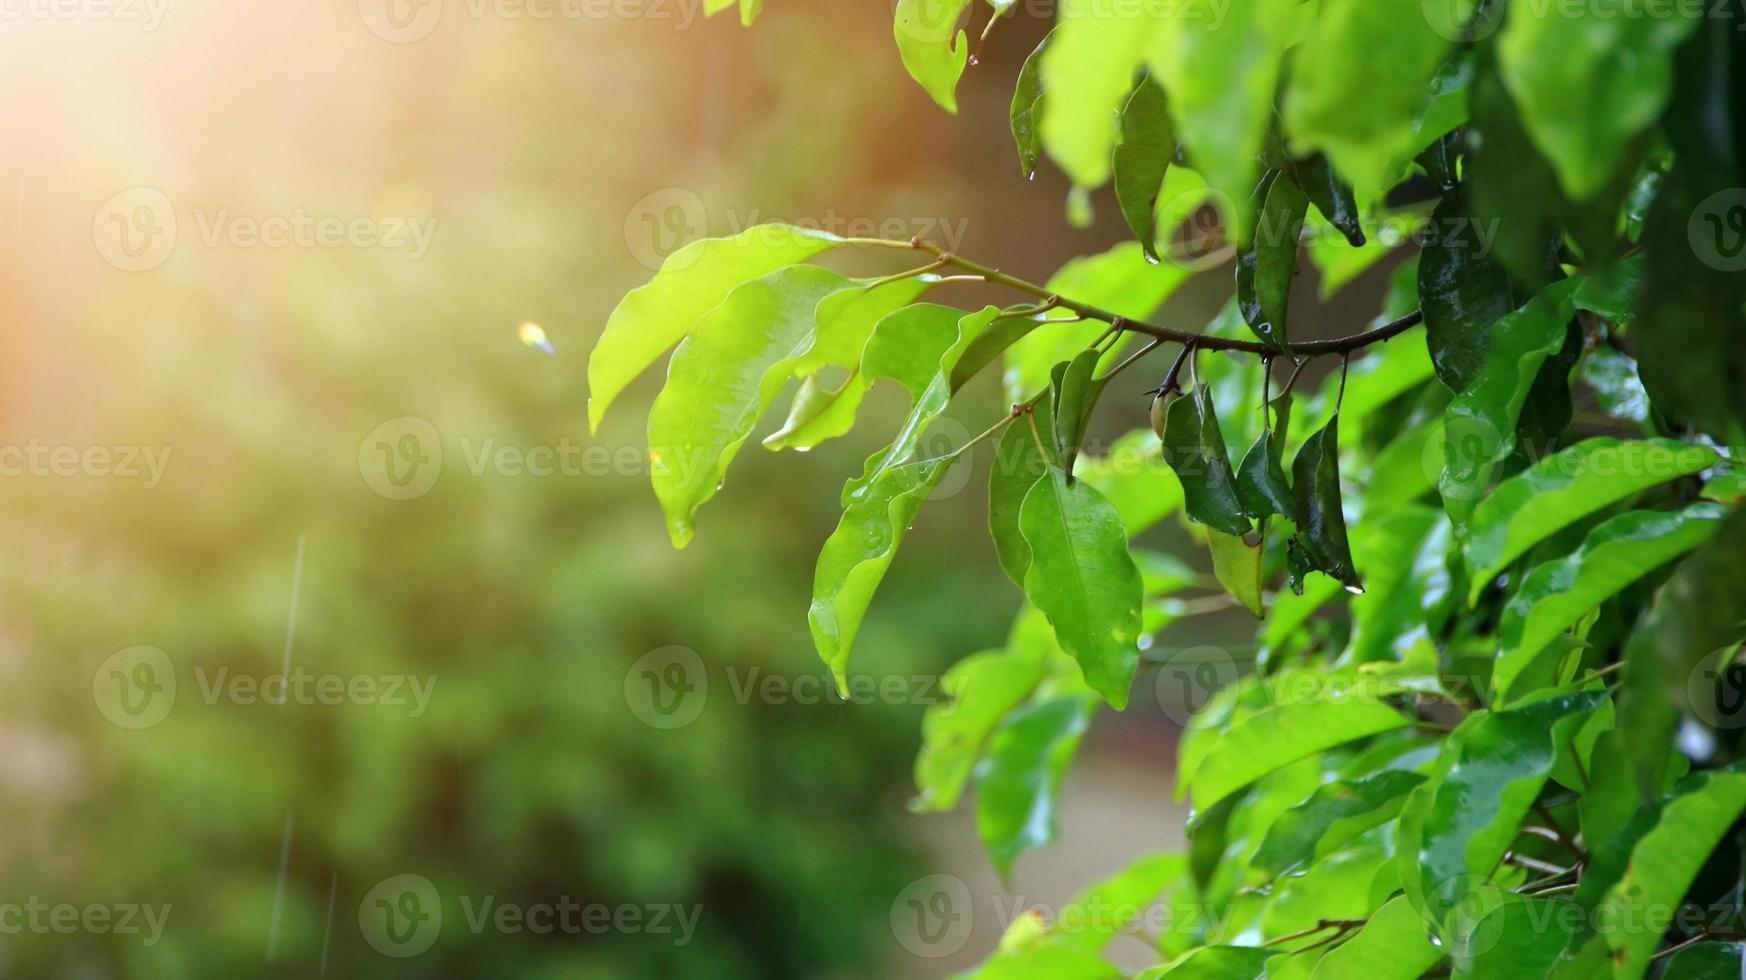 boom laat nat na blootstelling aan regen in de ochtend foto